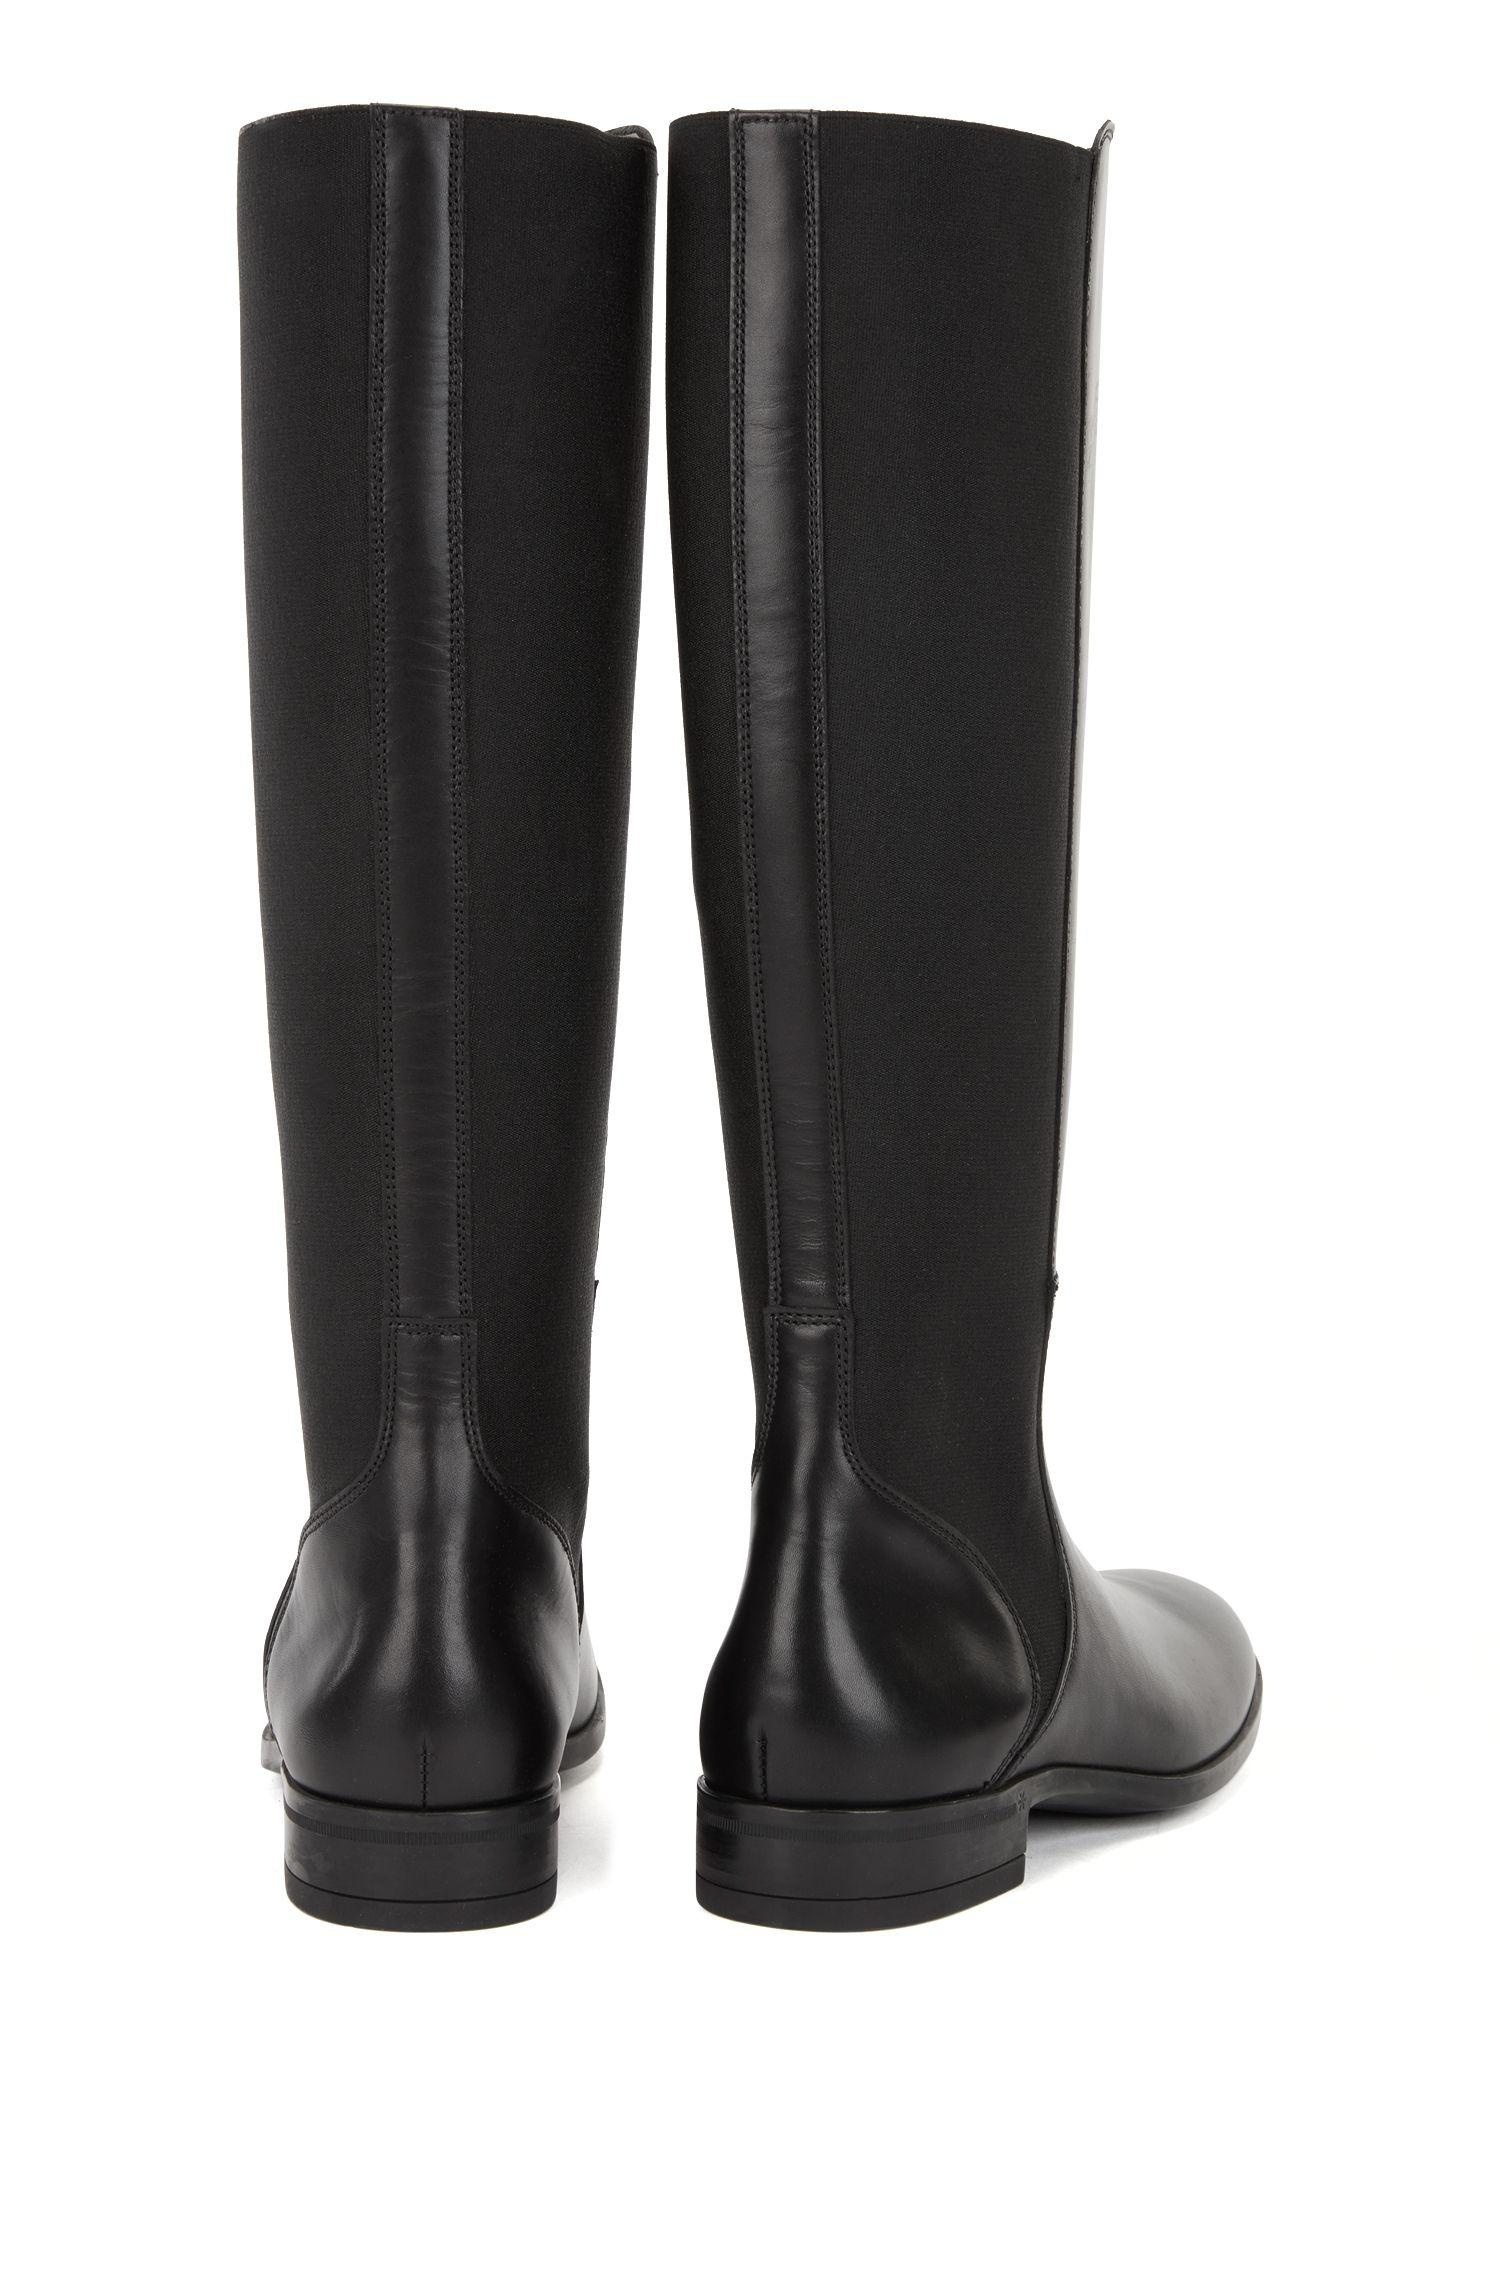 hugo boss ladies boots off 60% - www